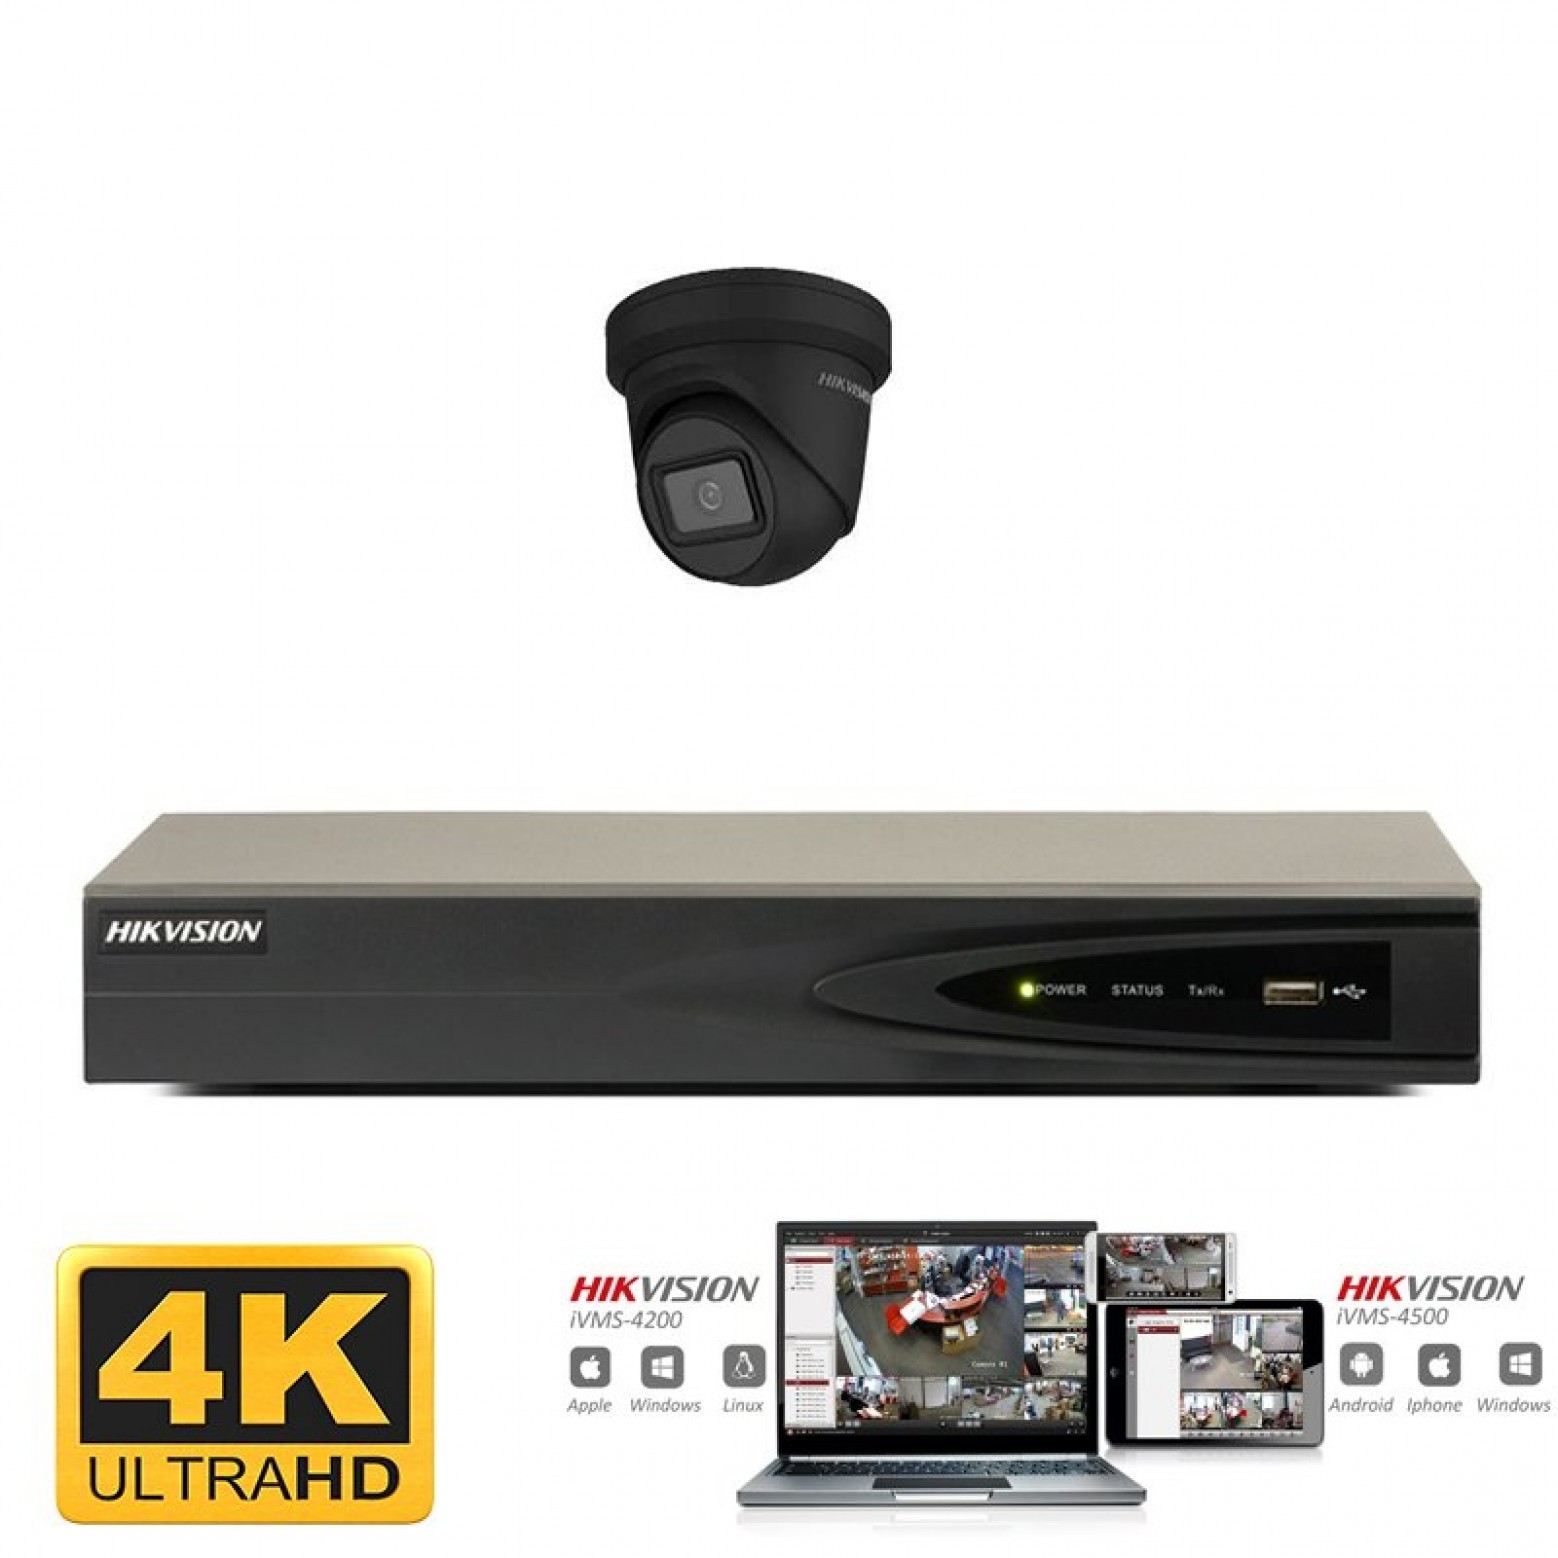 Hikvision IP camera set 1x turret zwart 8 megapixel (4K) Full HD